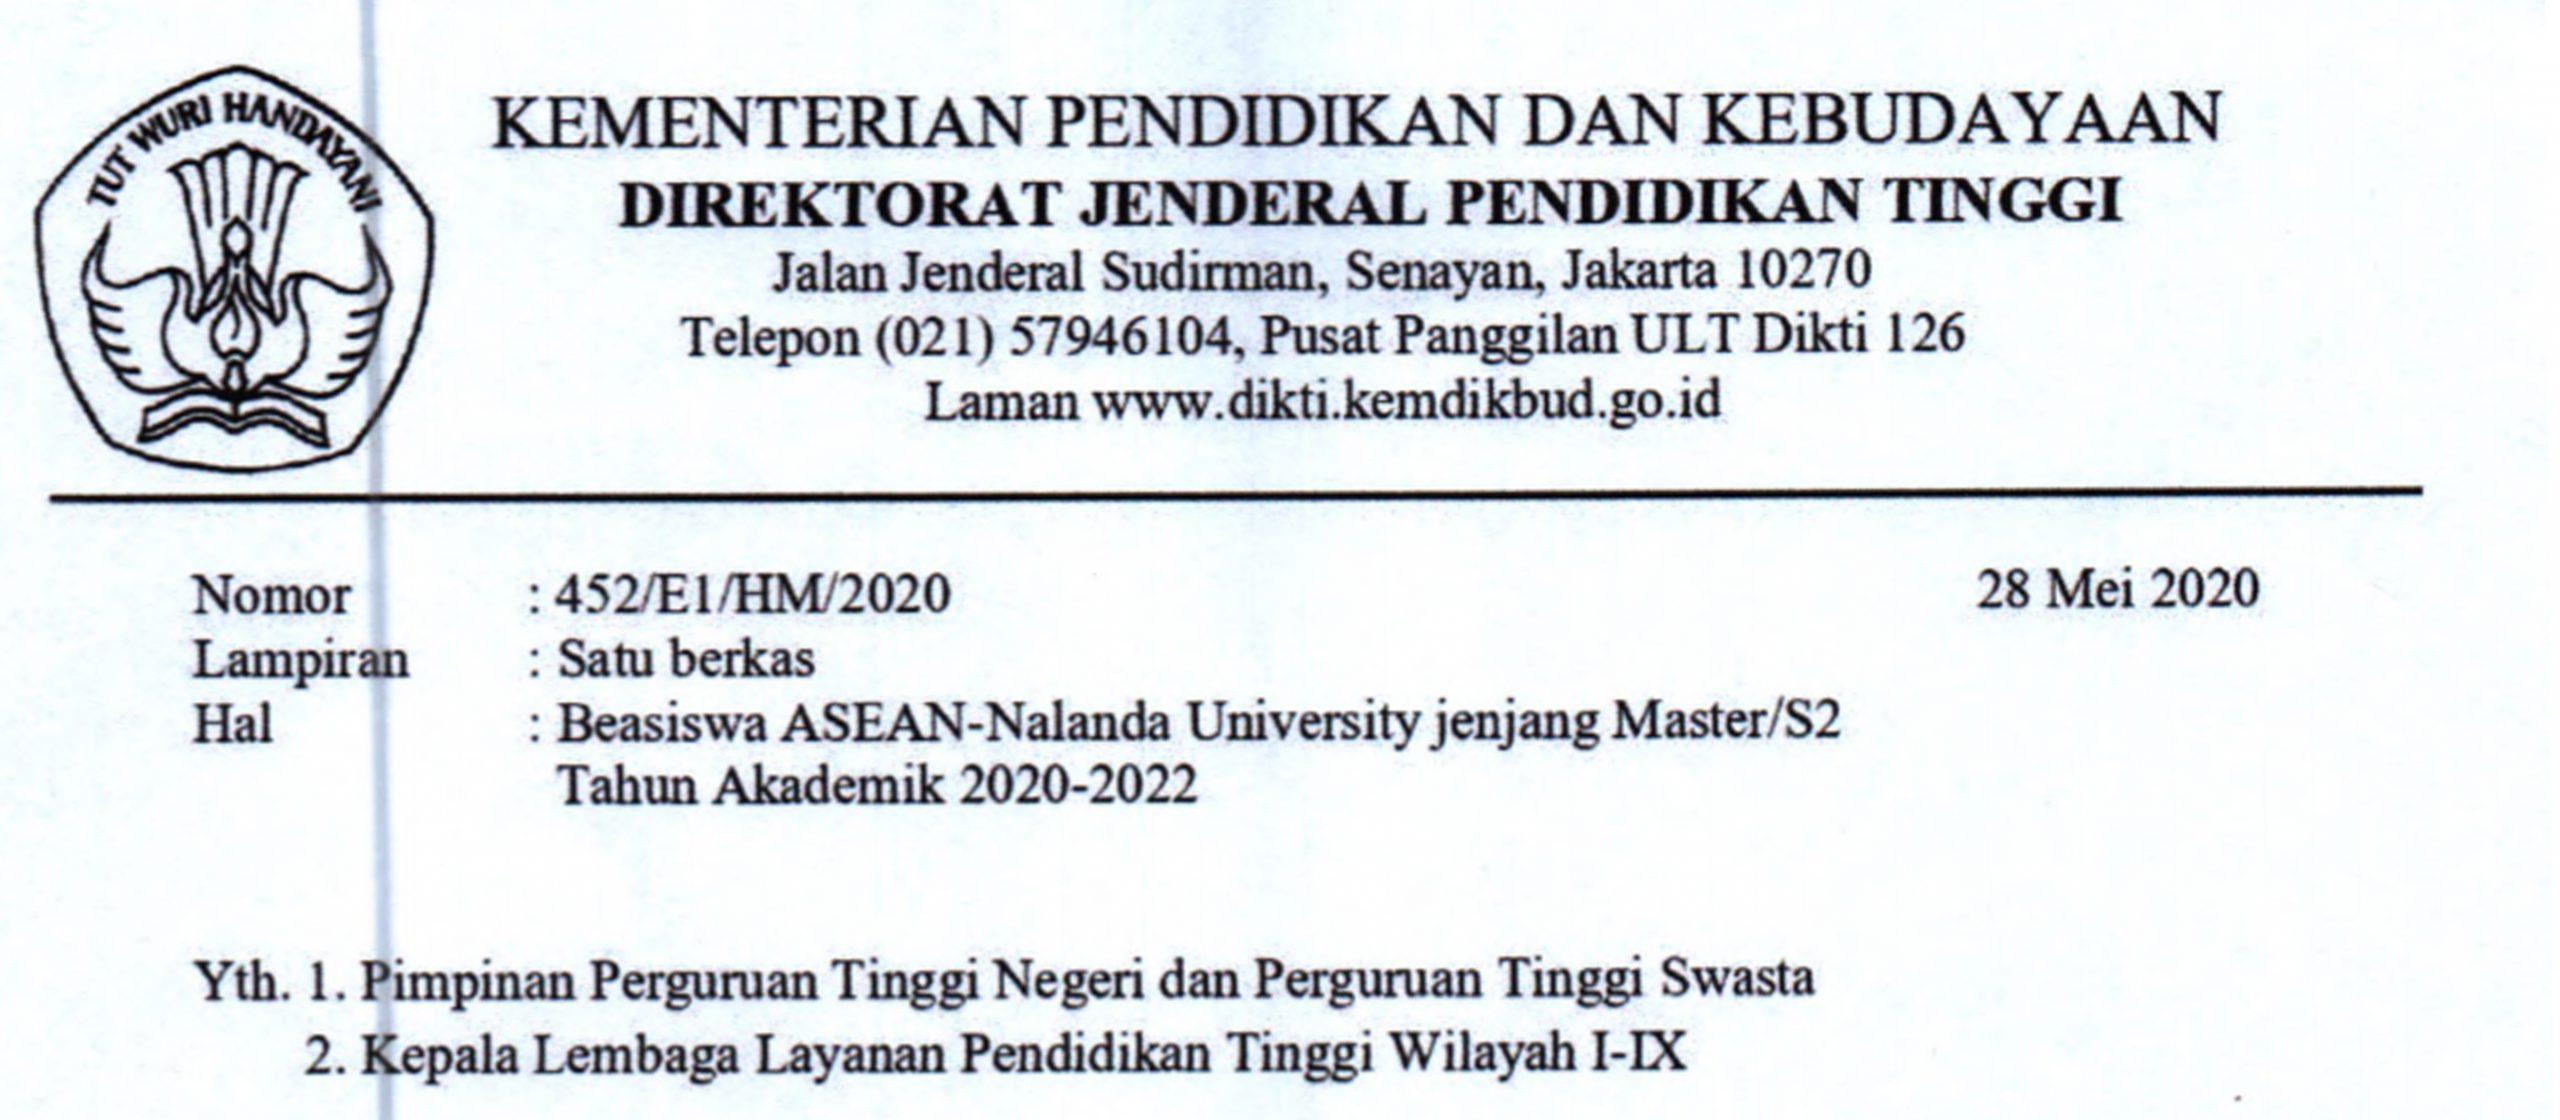 Beasiswa ASEAN – Nalanda University jenjang Master/S2 Tahun Akademik 2020 -2022